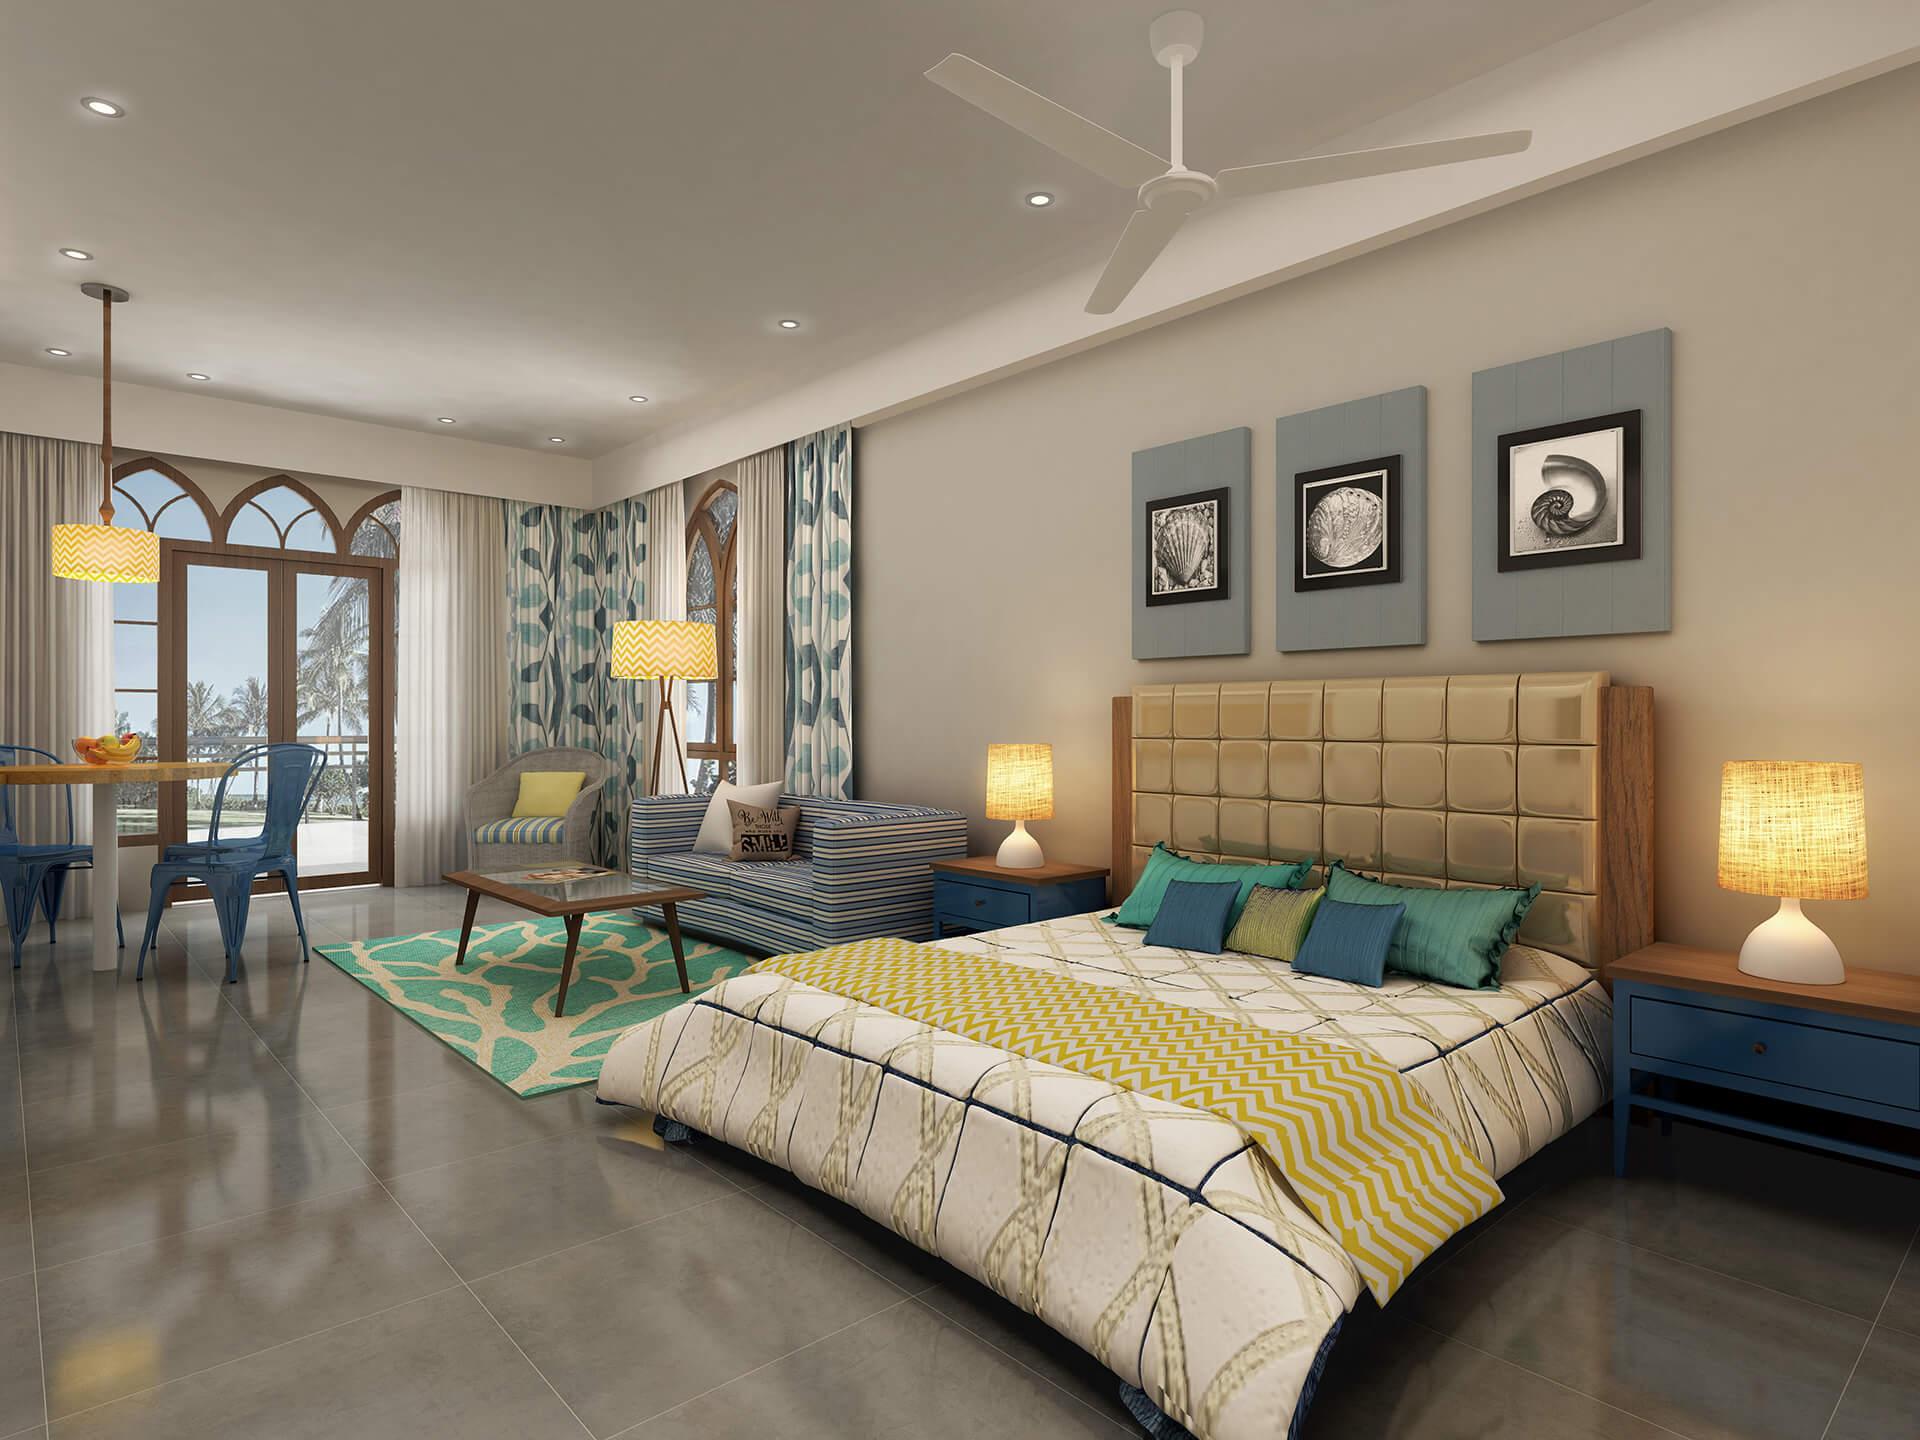 Resort Room Concepts